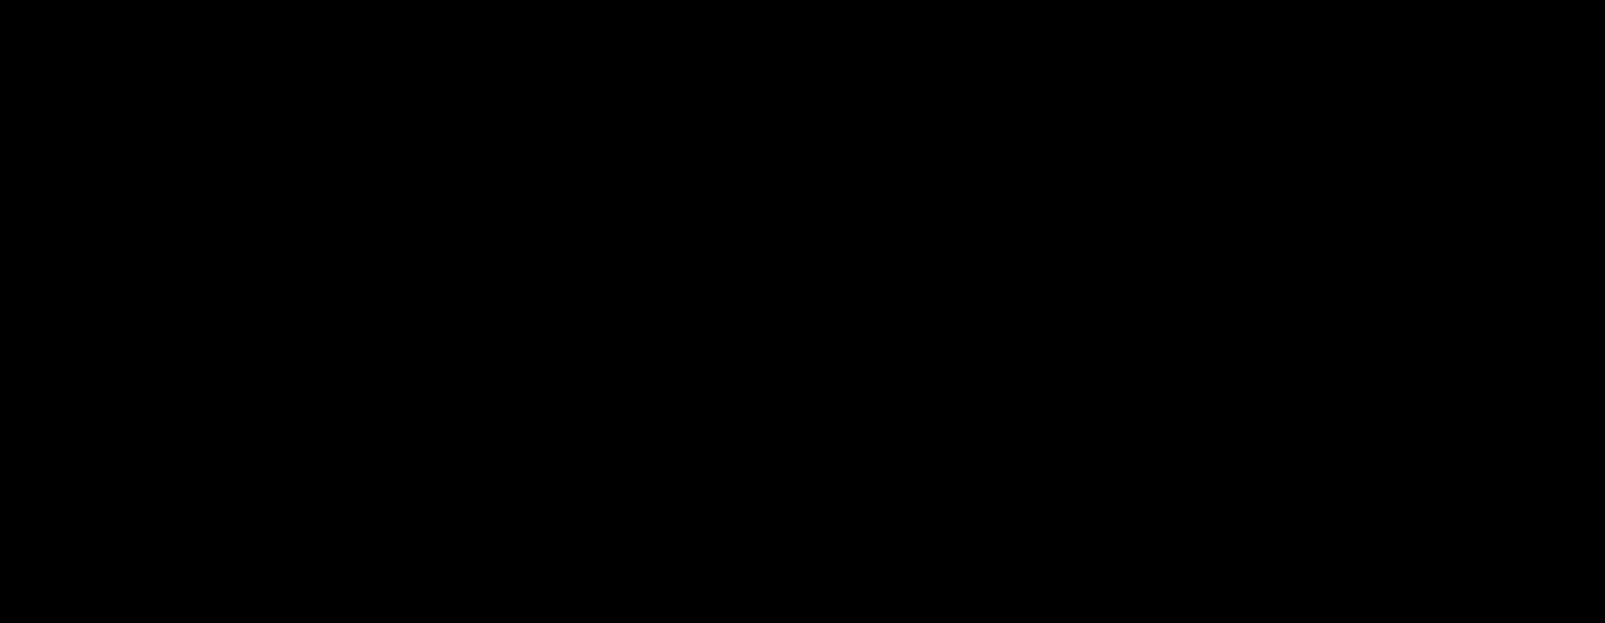 image61.png